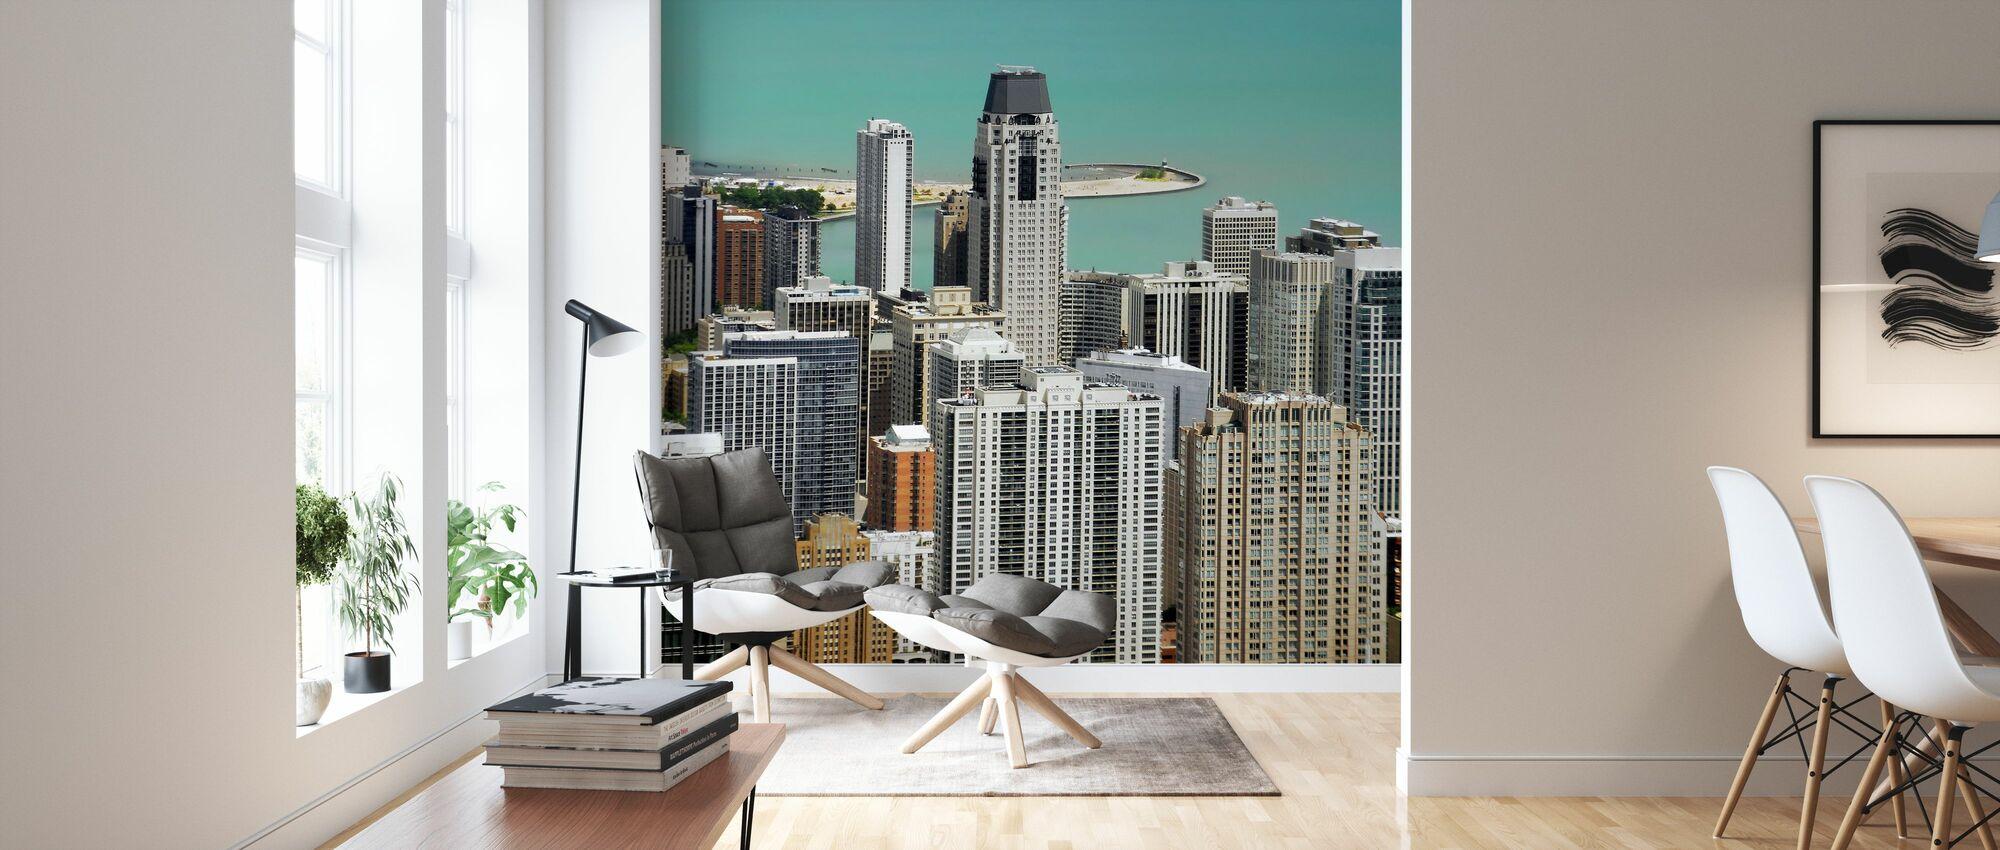 Chicago and Lake Michigan - Wallpaper - Living Room